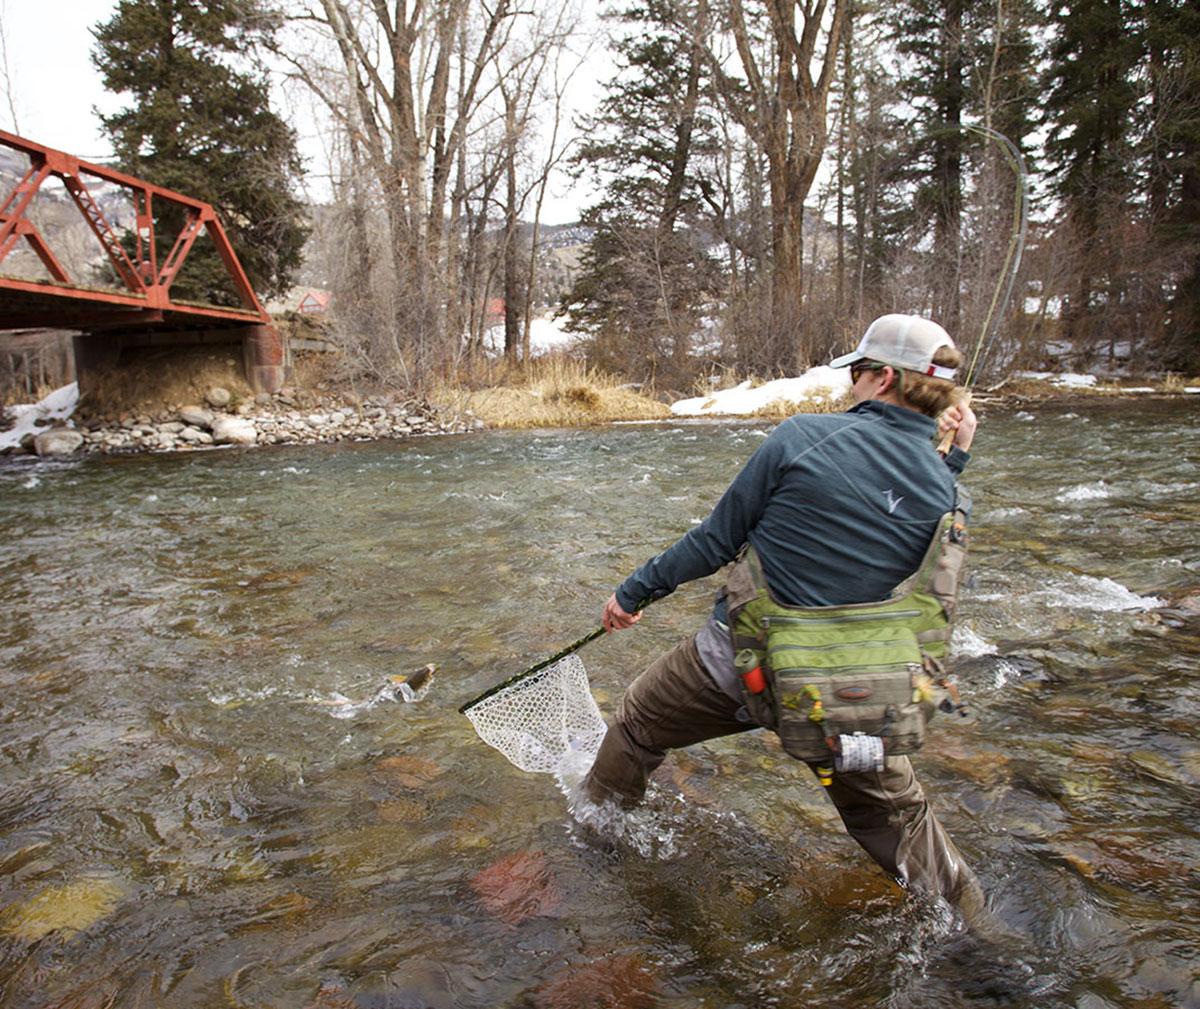 Fishpond nomad el jefe fly fishing landing net carbon for Fishing landing net